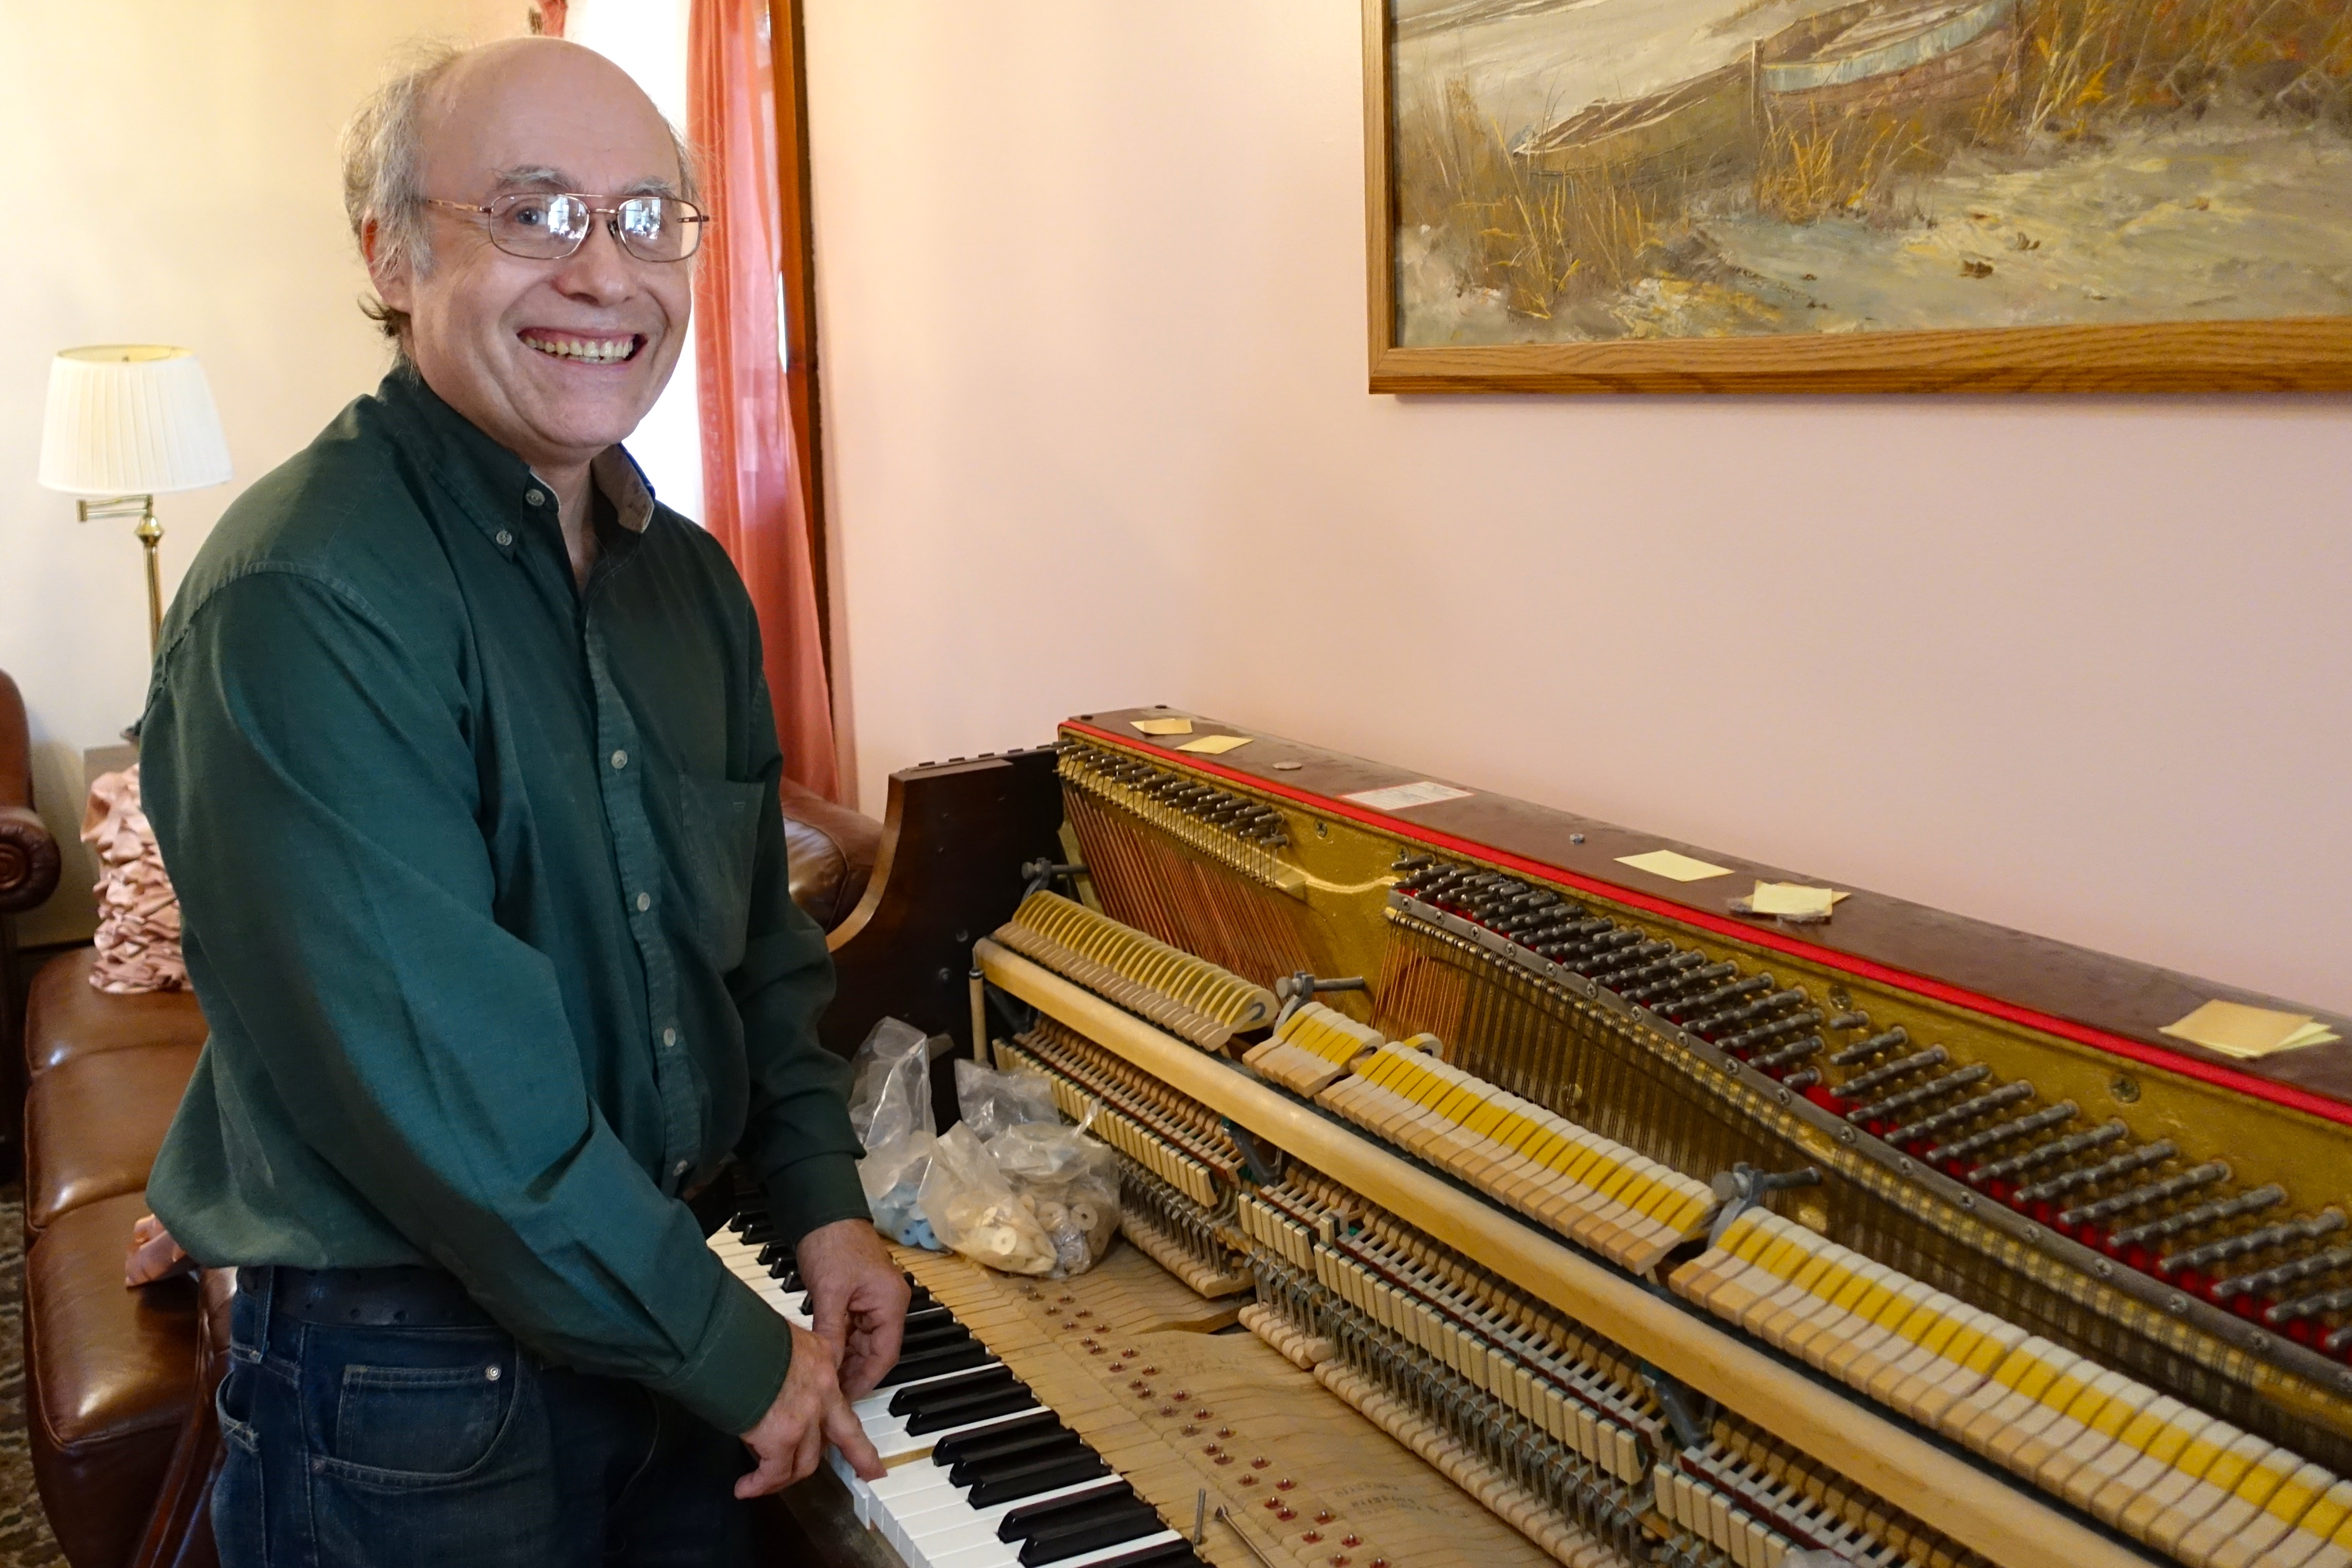 Steve Jewell. Piano tuner